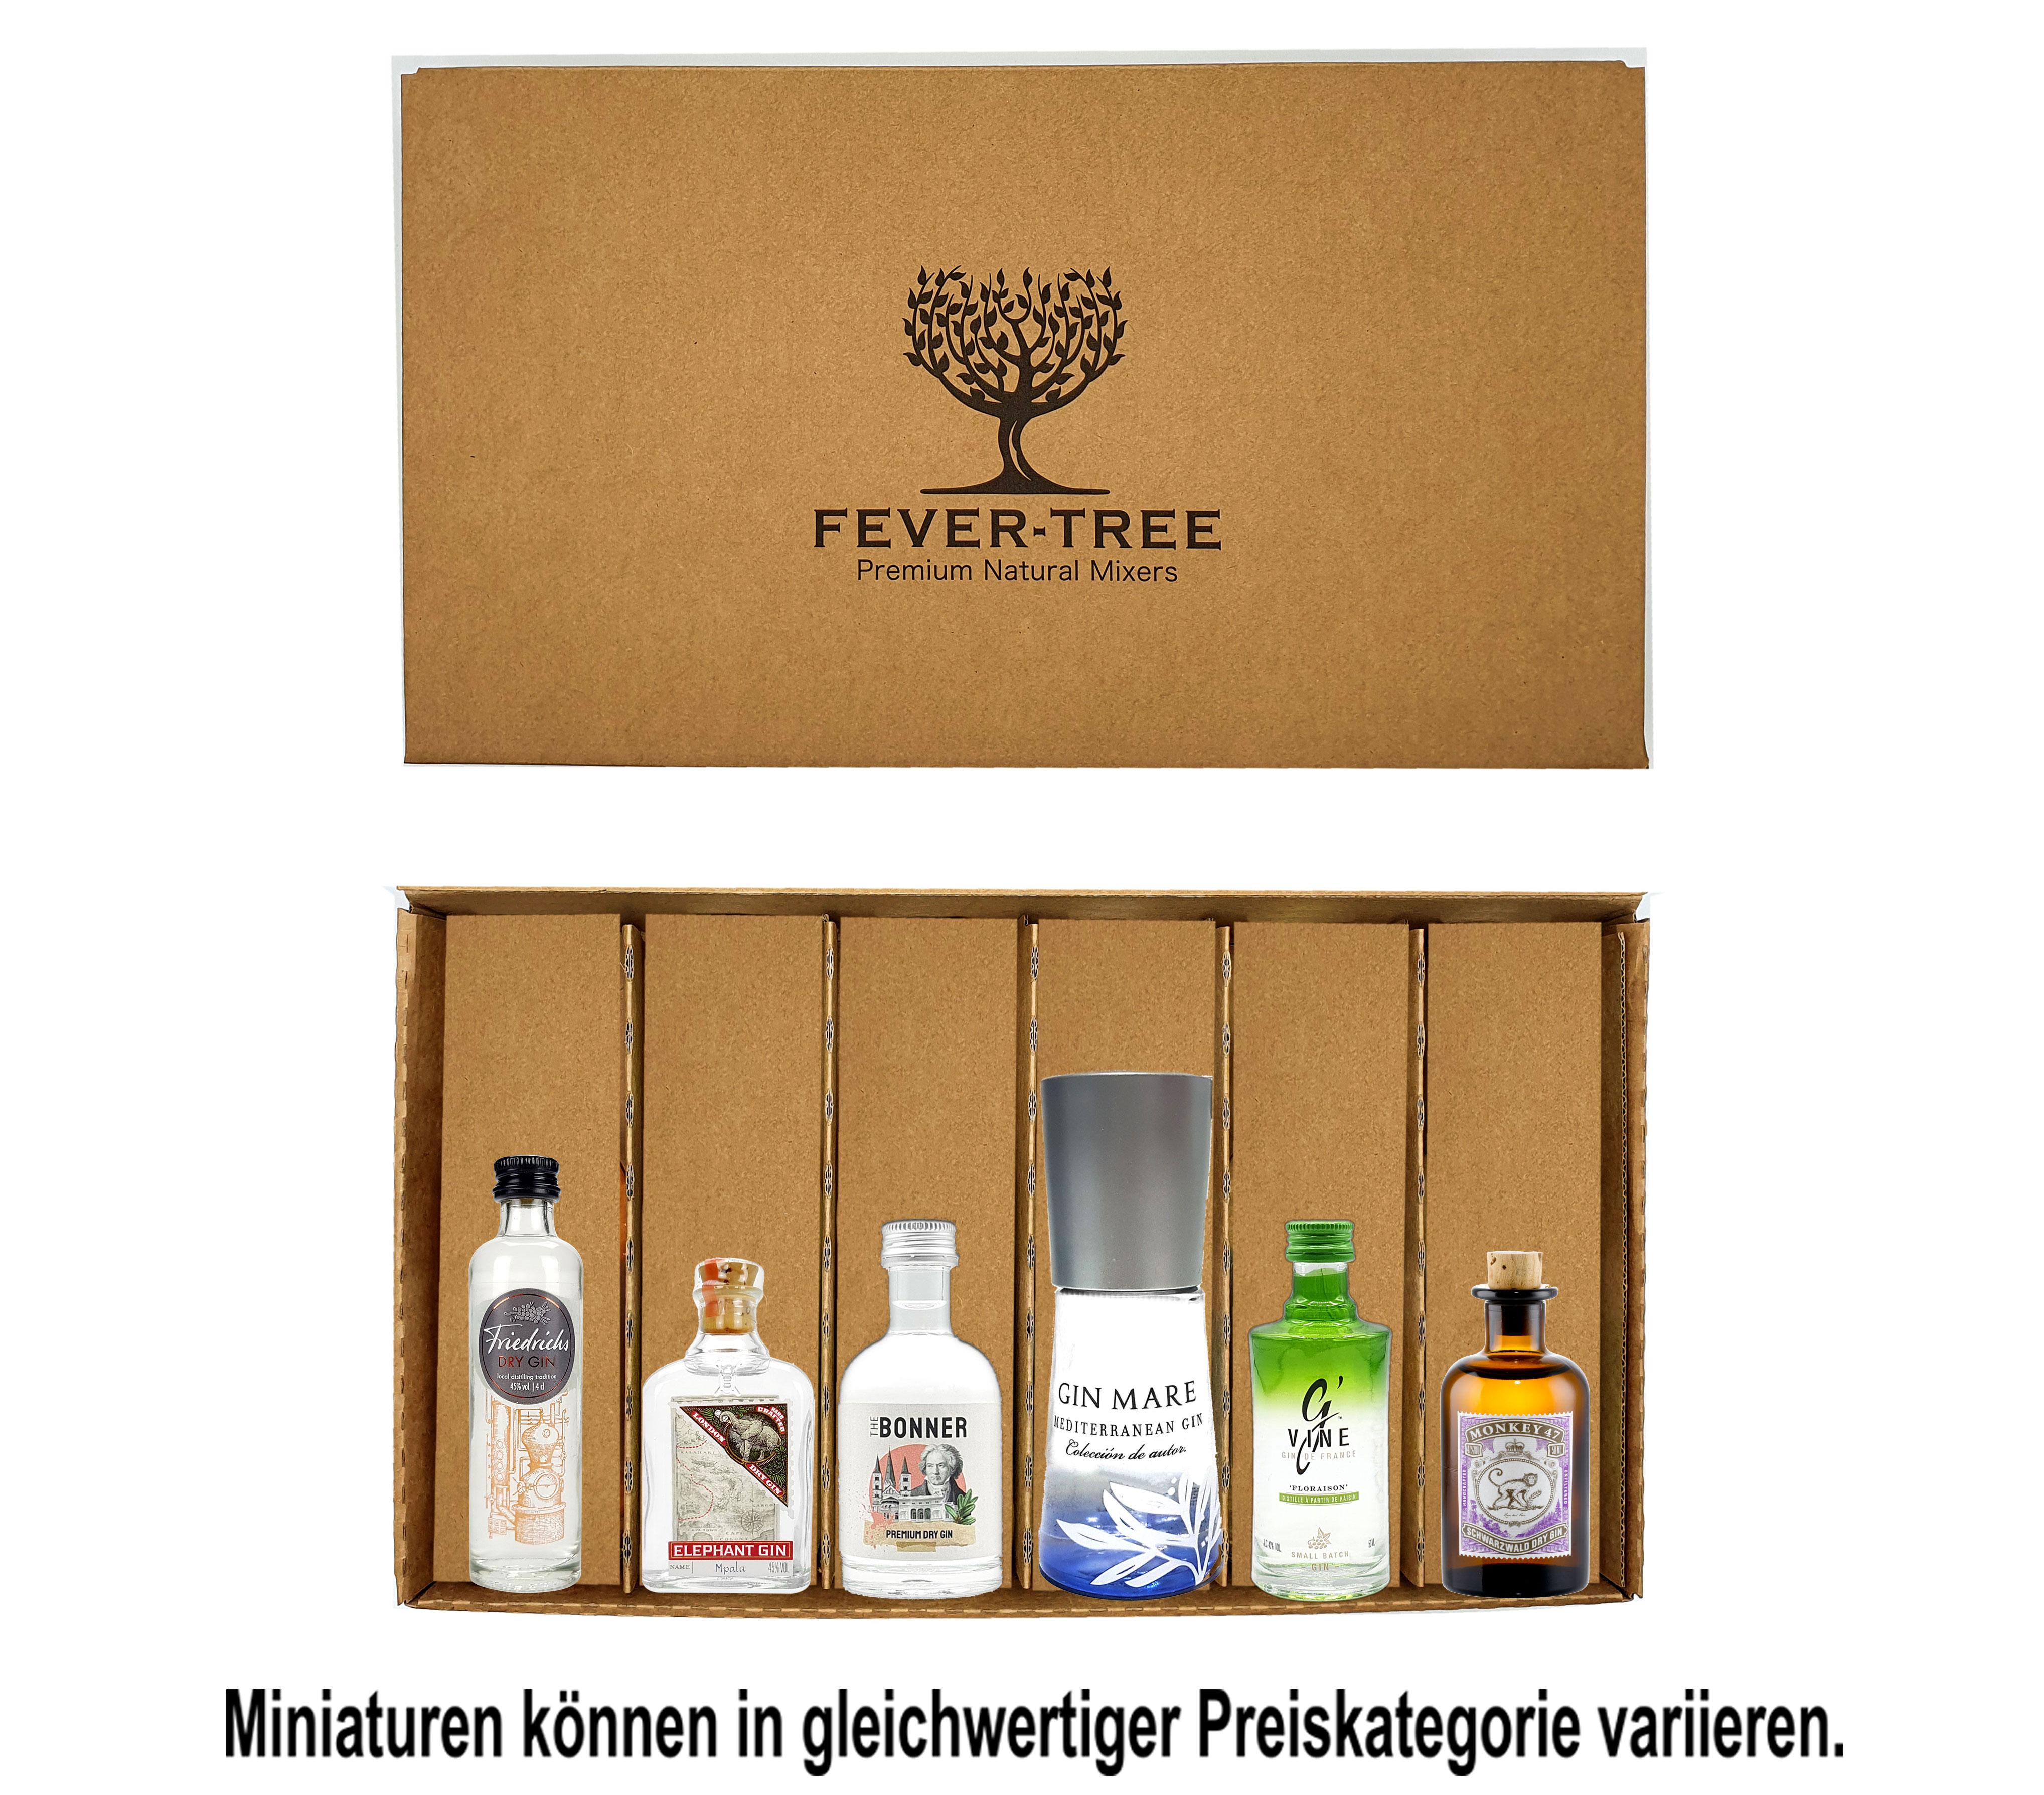 Gin Probierset Geschenkset - 6x verschiedene Gin Minis (Elephant, Gin Mare, Monkey, The Bonner, GVine, Friedrichs) + Fever-Tree Geschenkbox